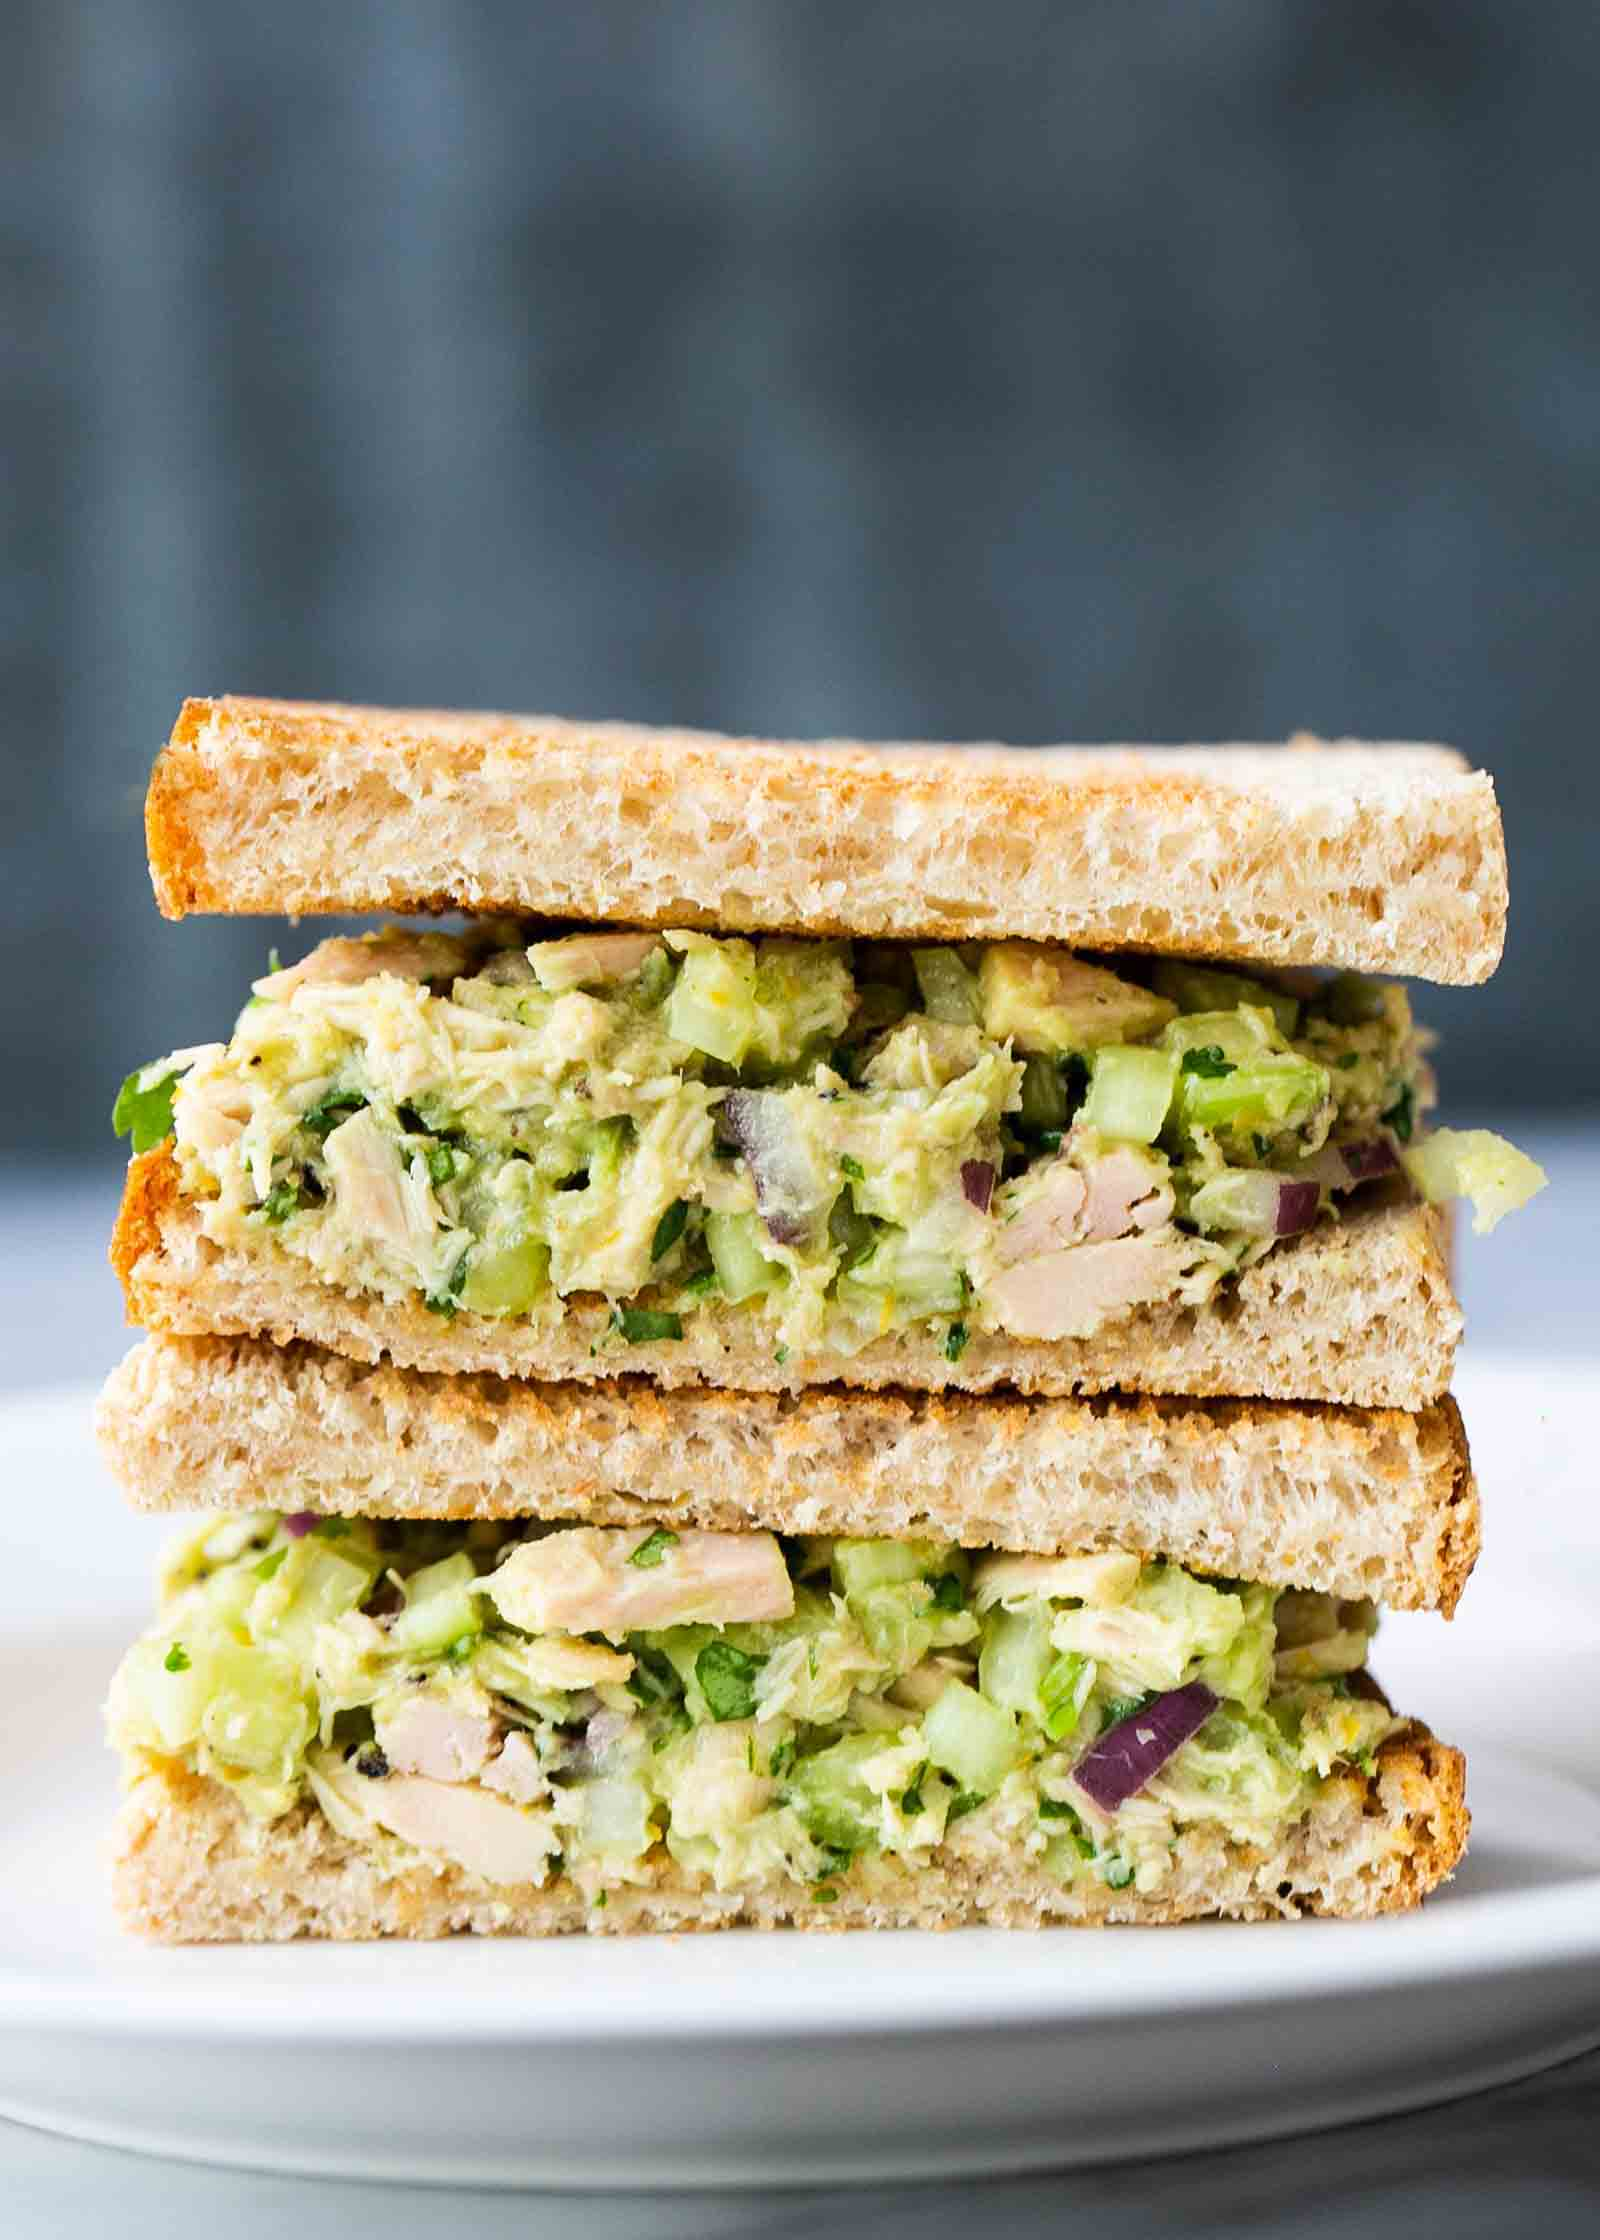 Avocado tuna salad sandwiches